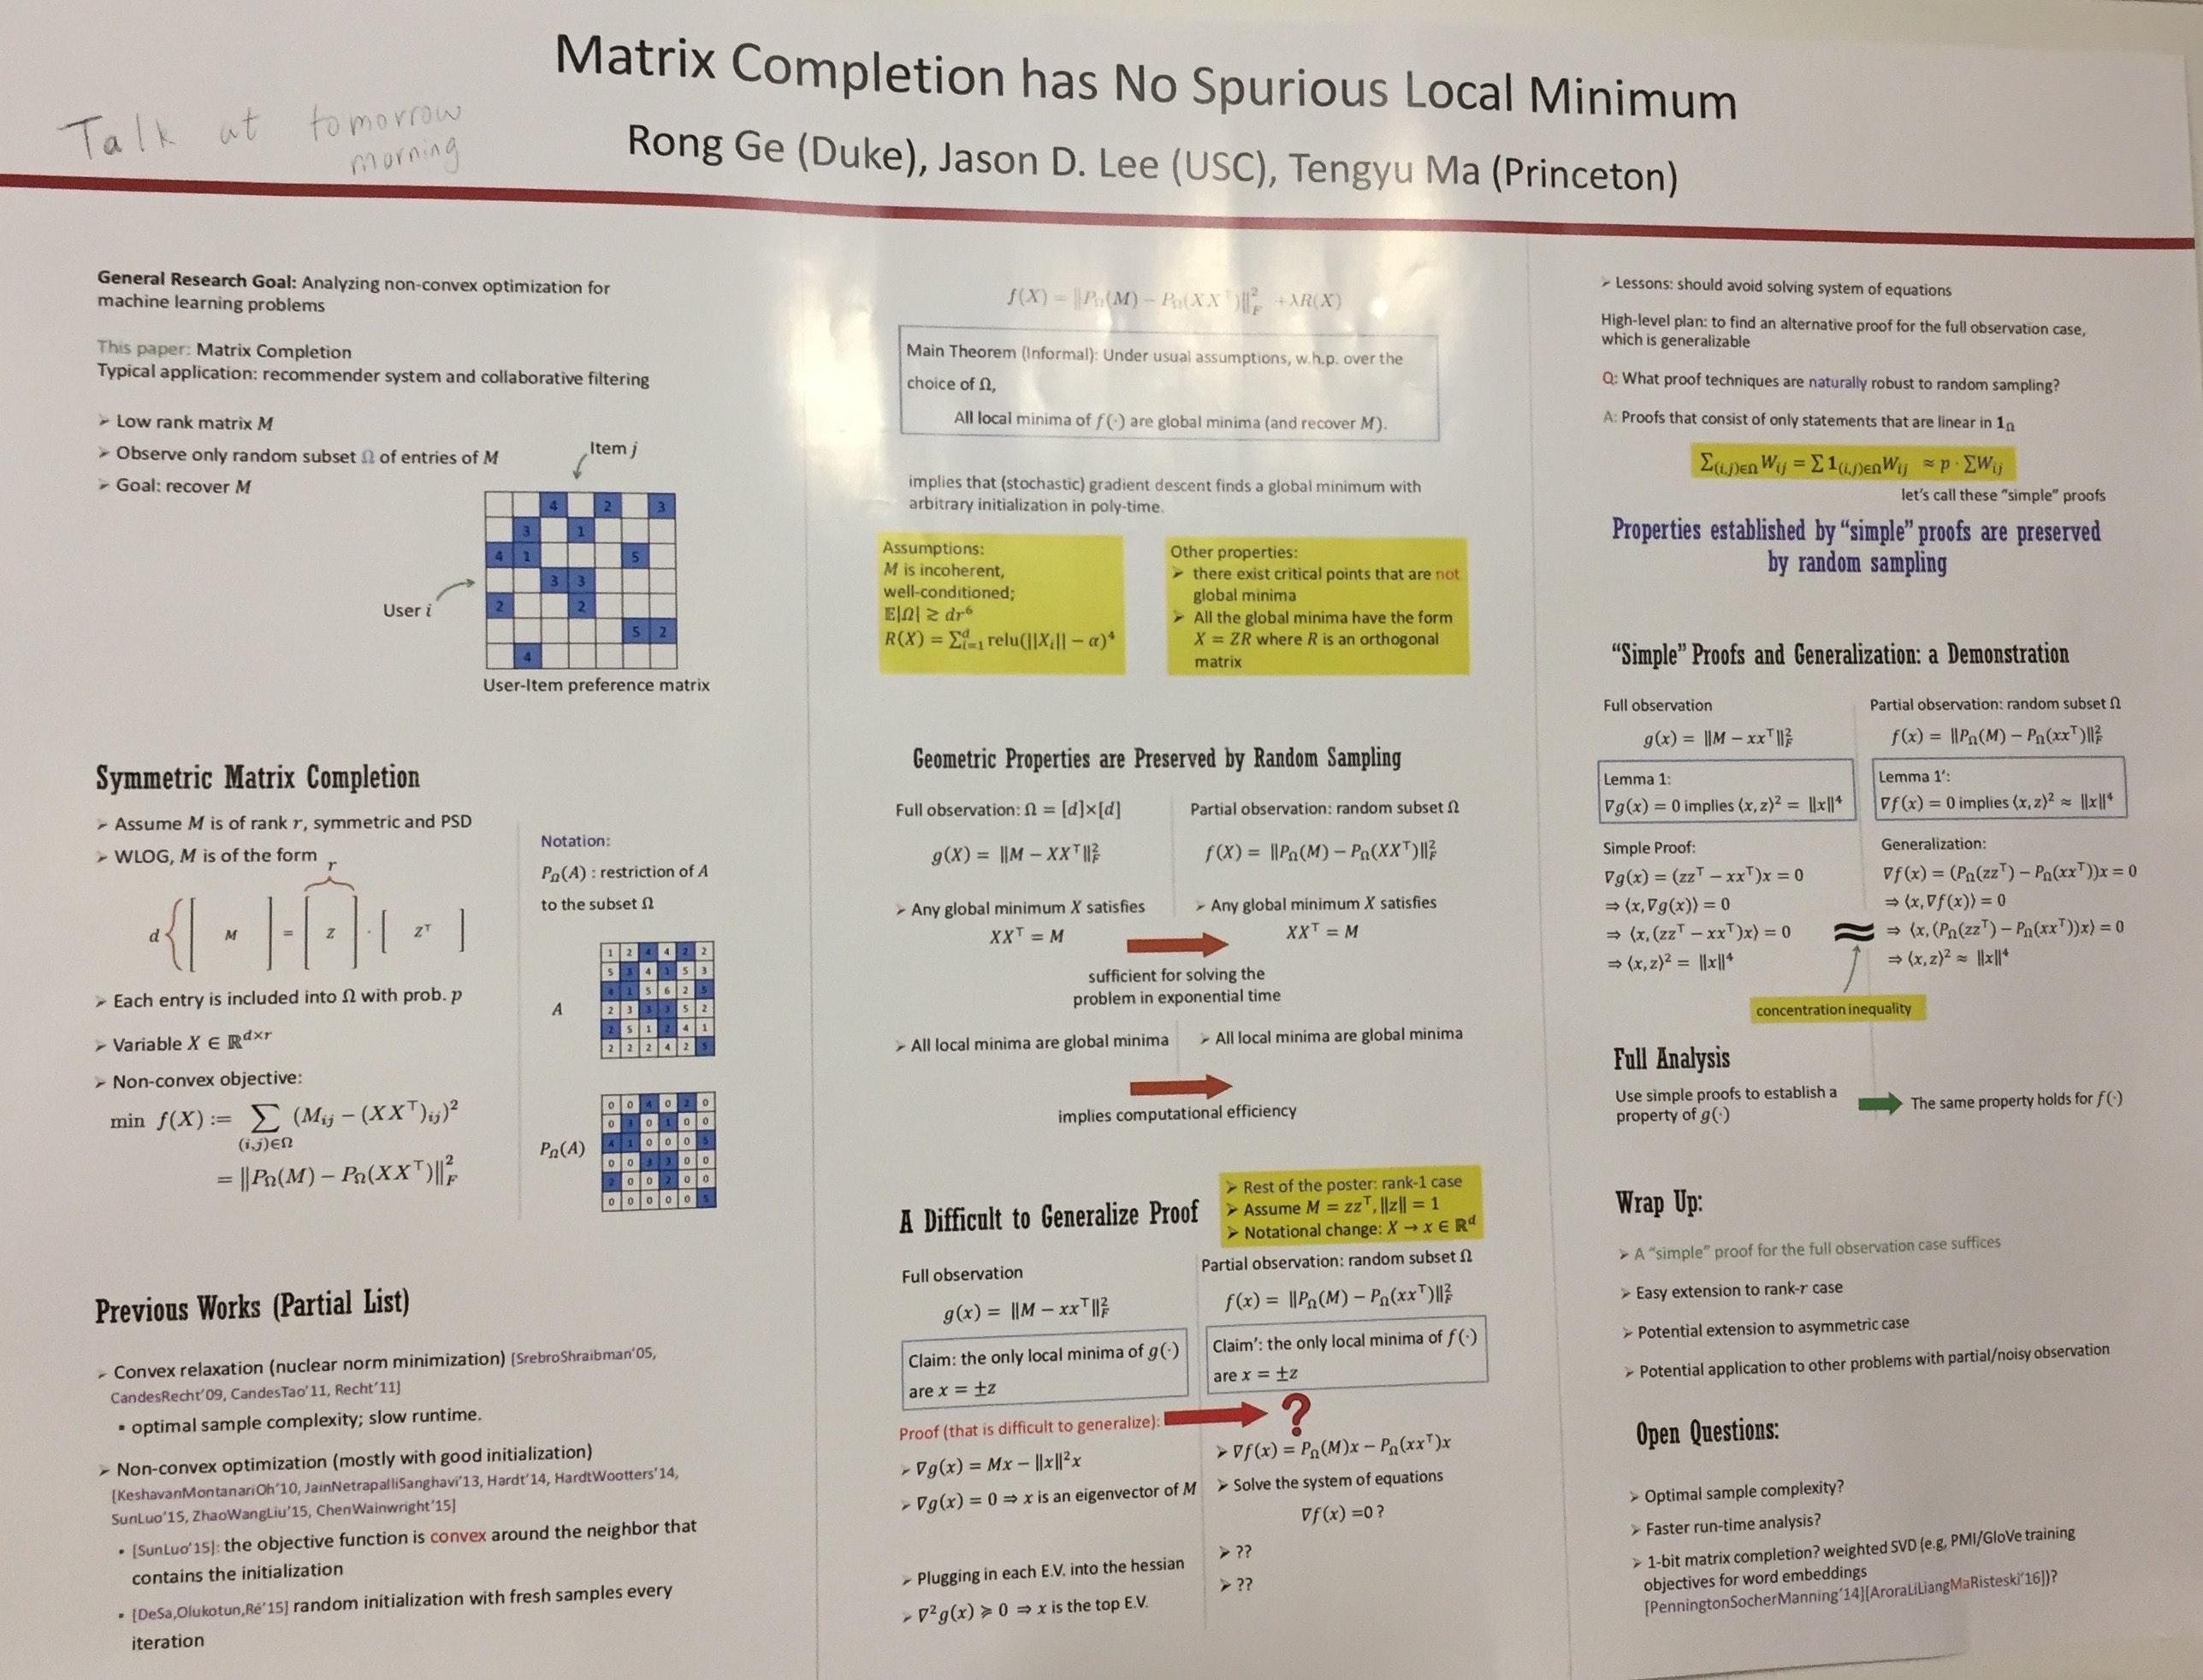 Ge_Matrix_Completion_has_No_Sprious_Local_Minimum.jpg